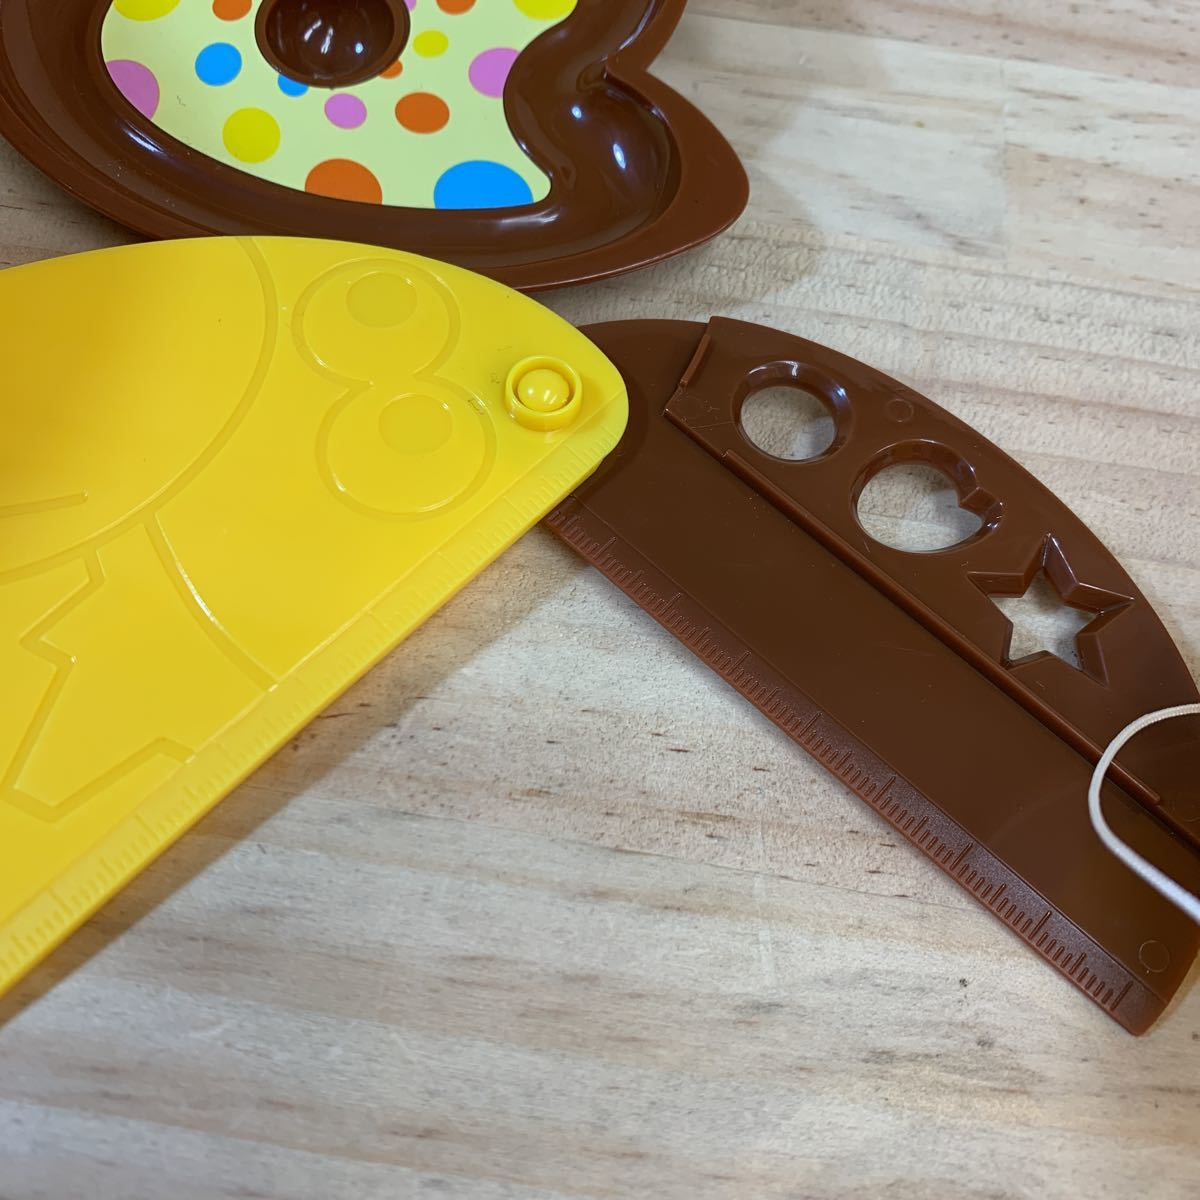 4N8728-5 しゃべる 金のキョロちゃん缶 森永チョコボール おもちゃのカンヅメ_画像9